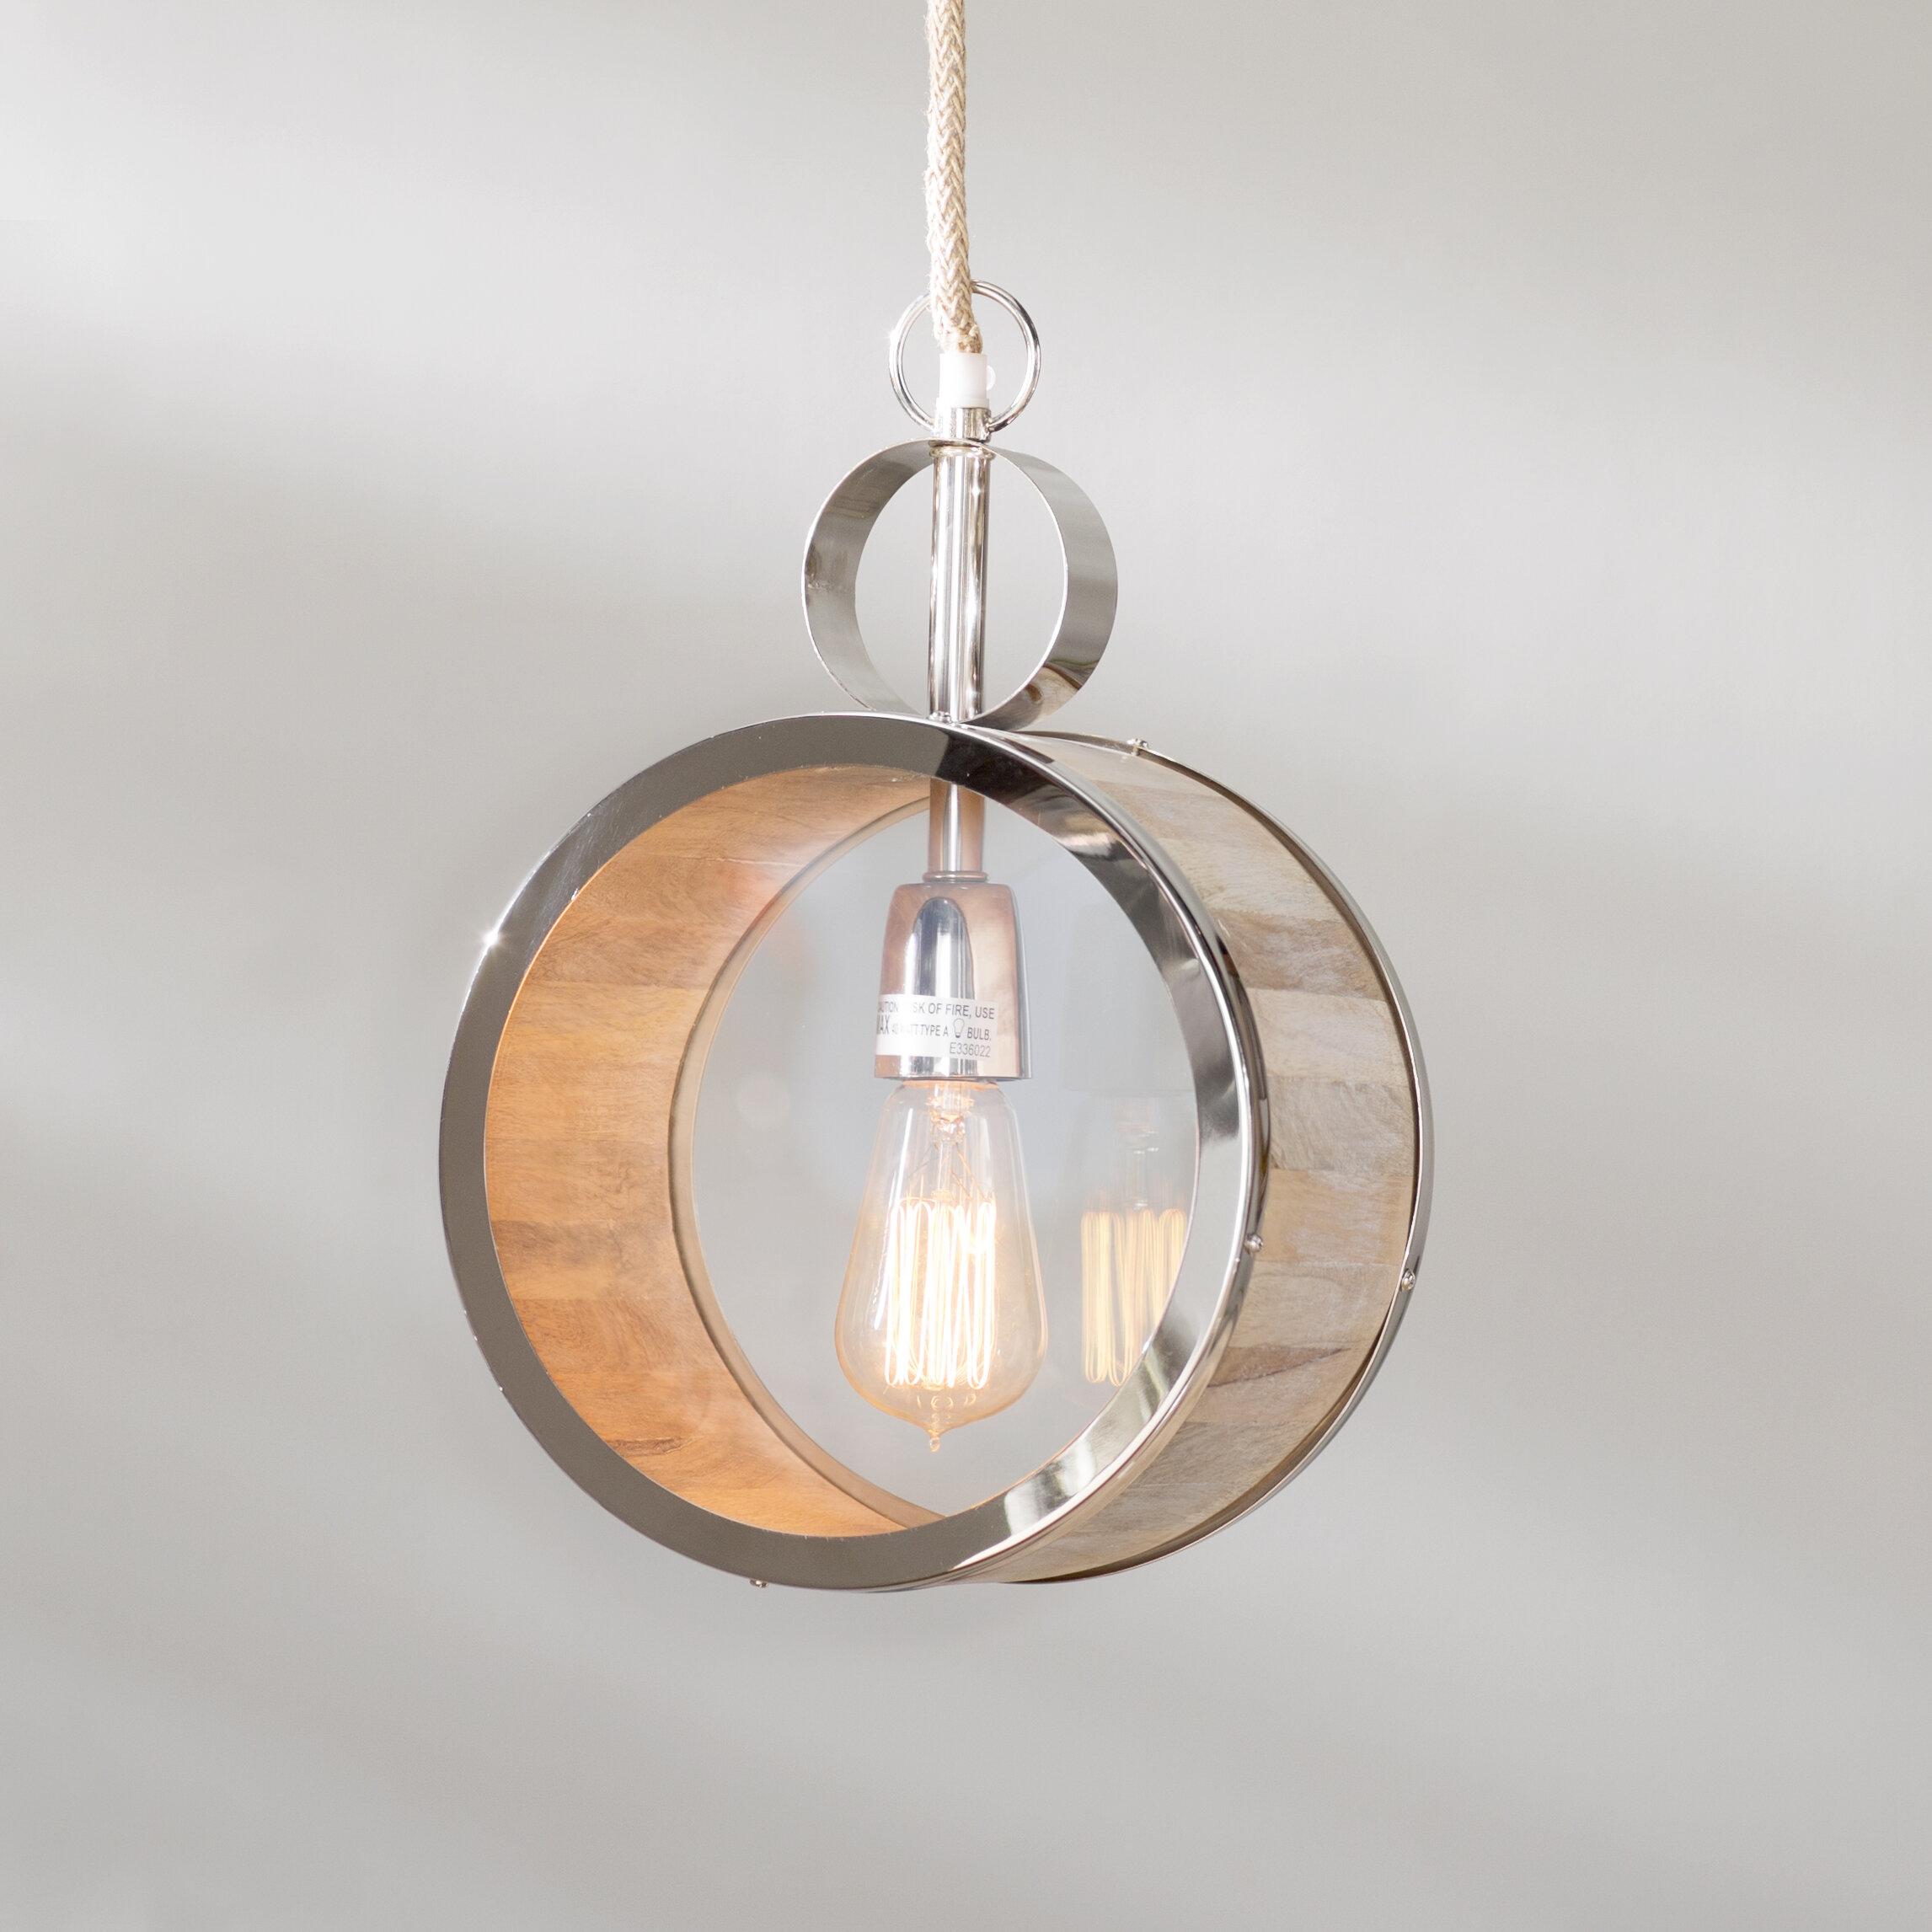 Ivy bronx merri 1 light globe pendant wayfair